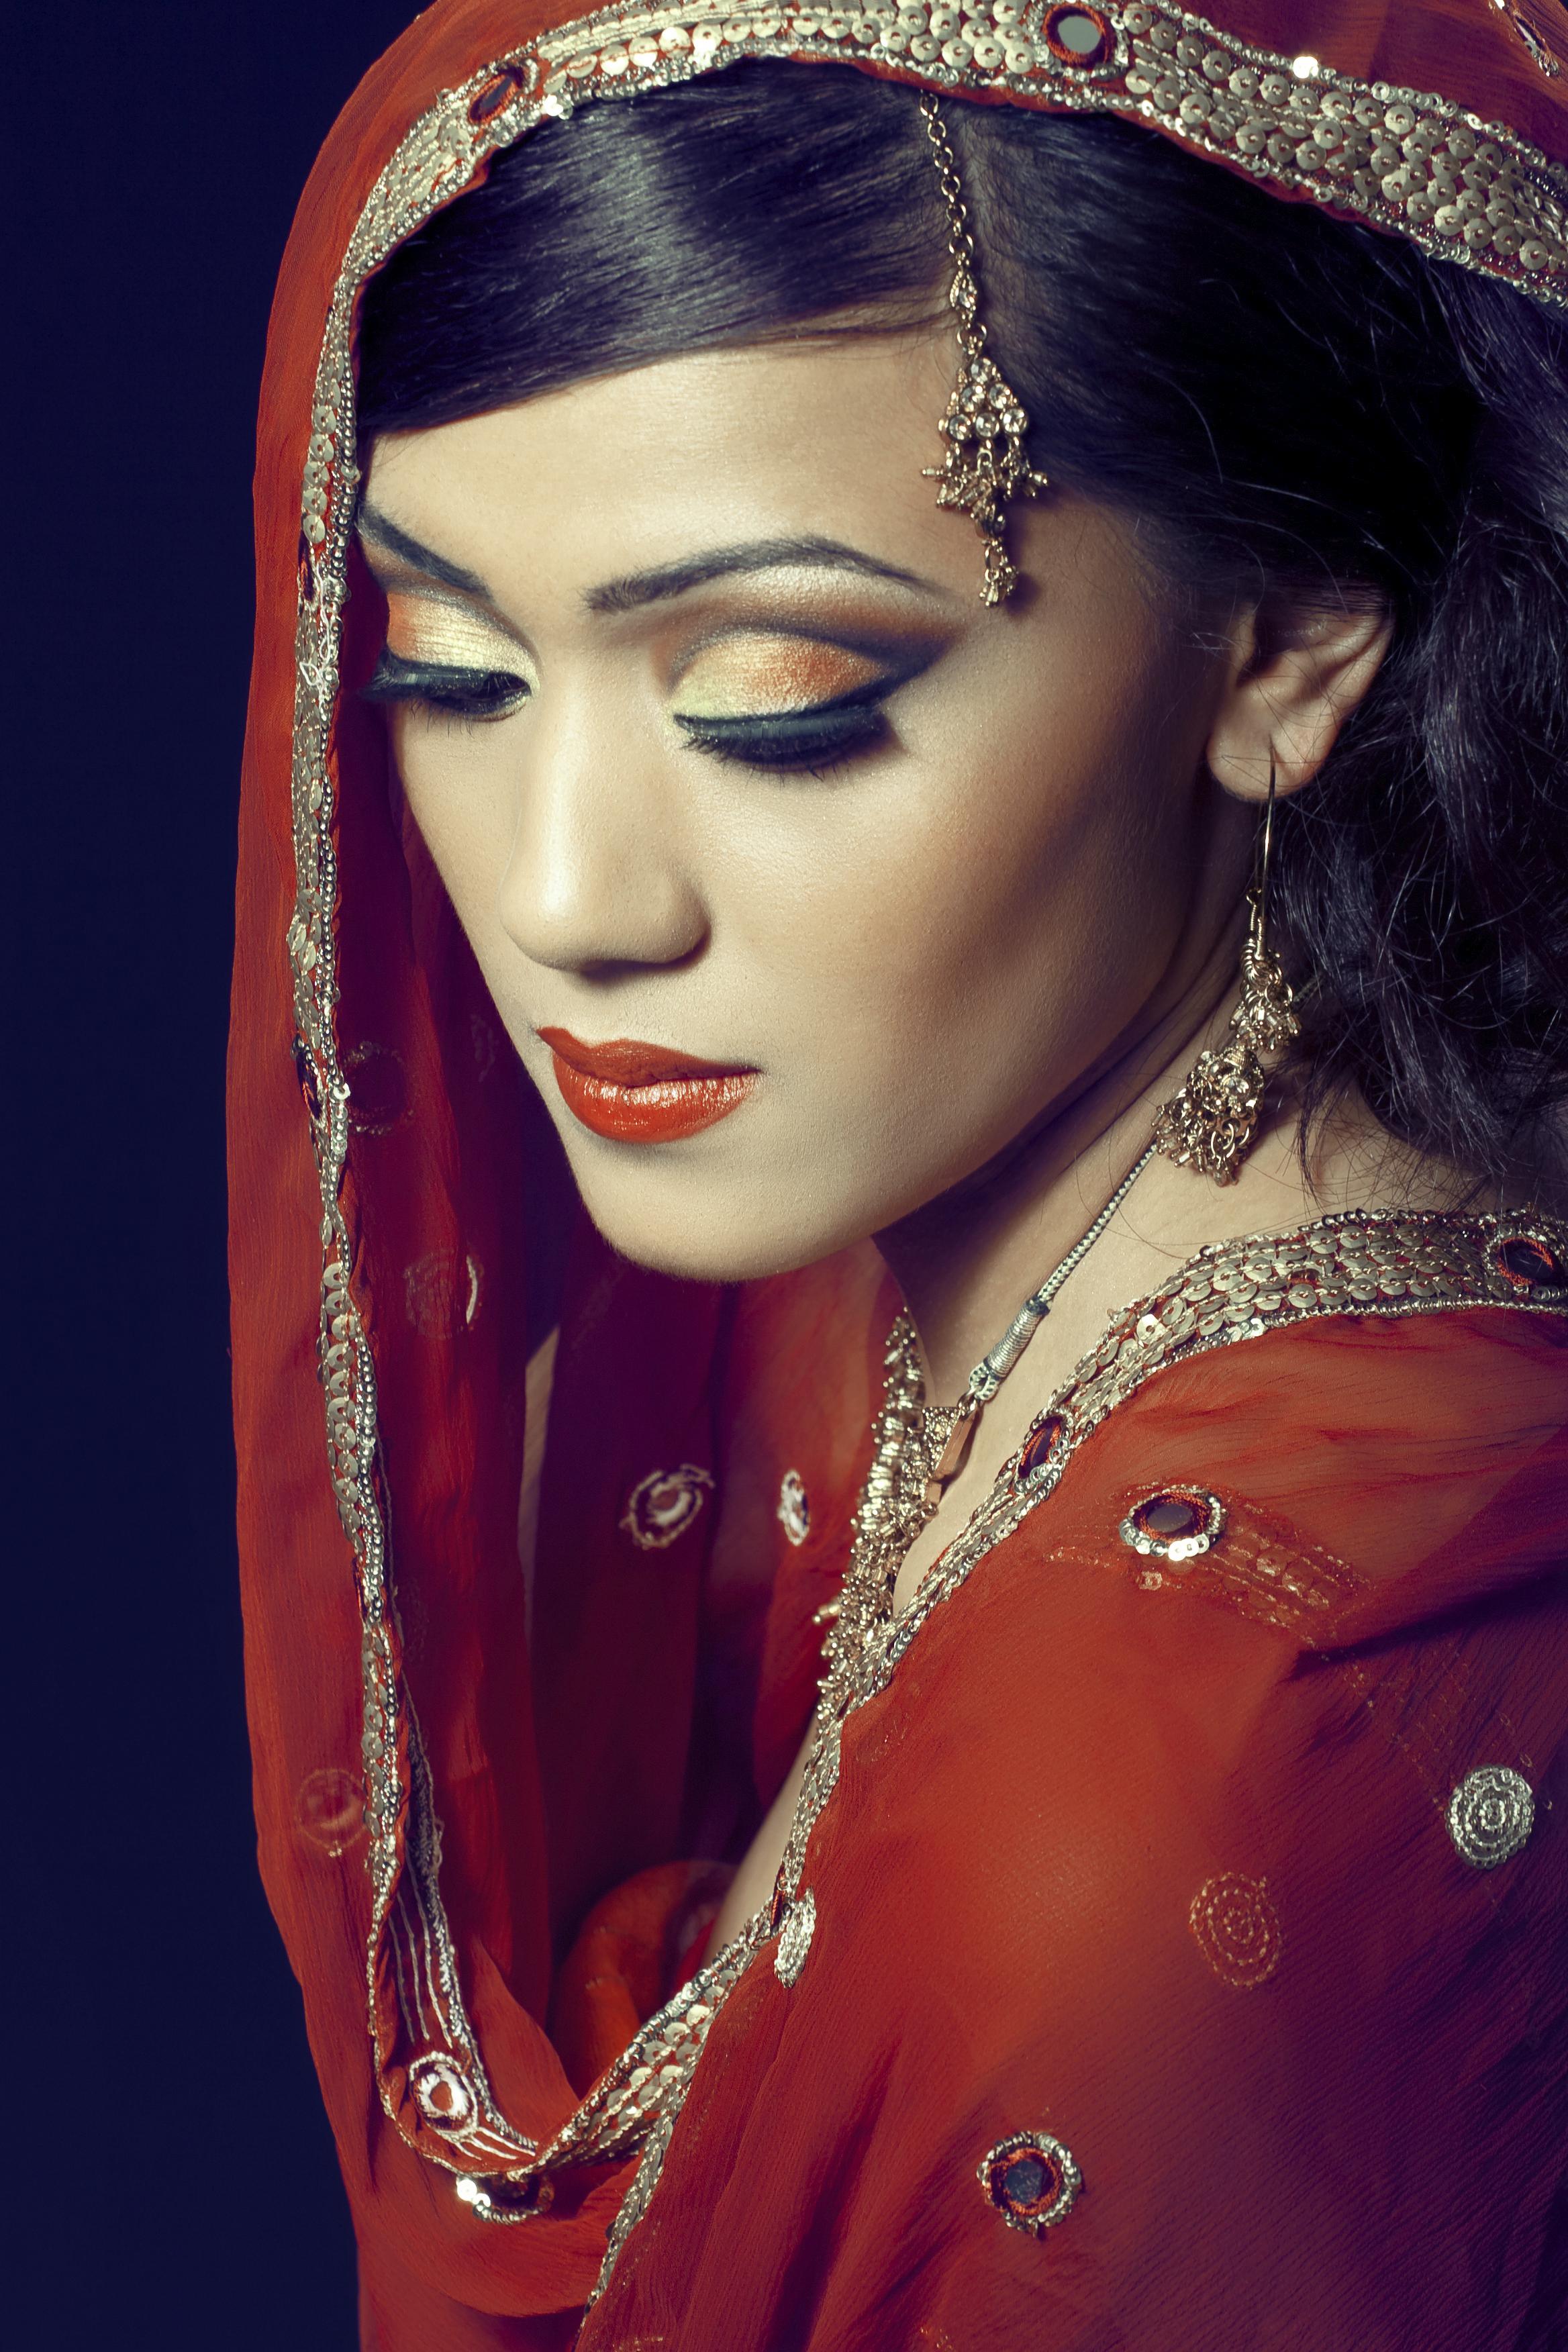 Indian Woman In Black Saree: FASHION AVENUE NEWS MAGAZINE